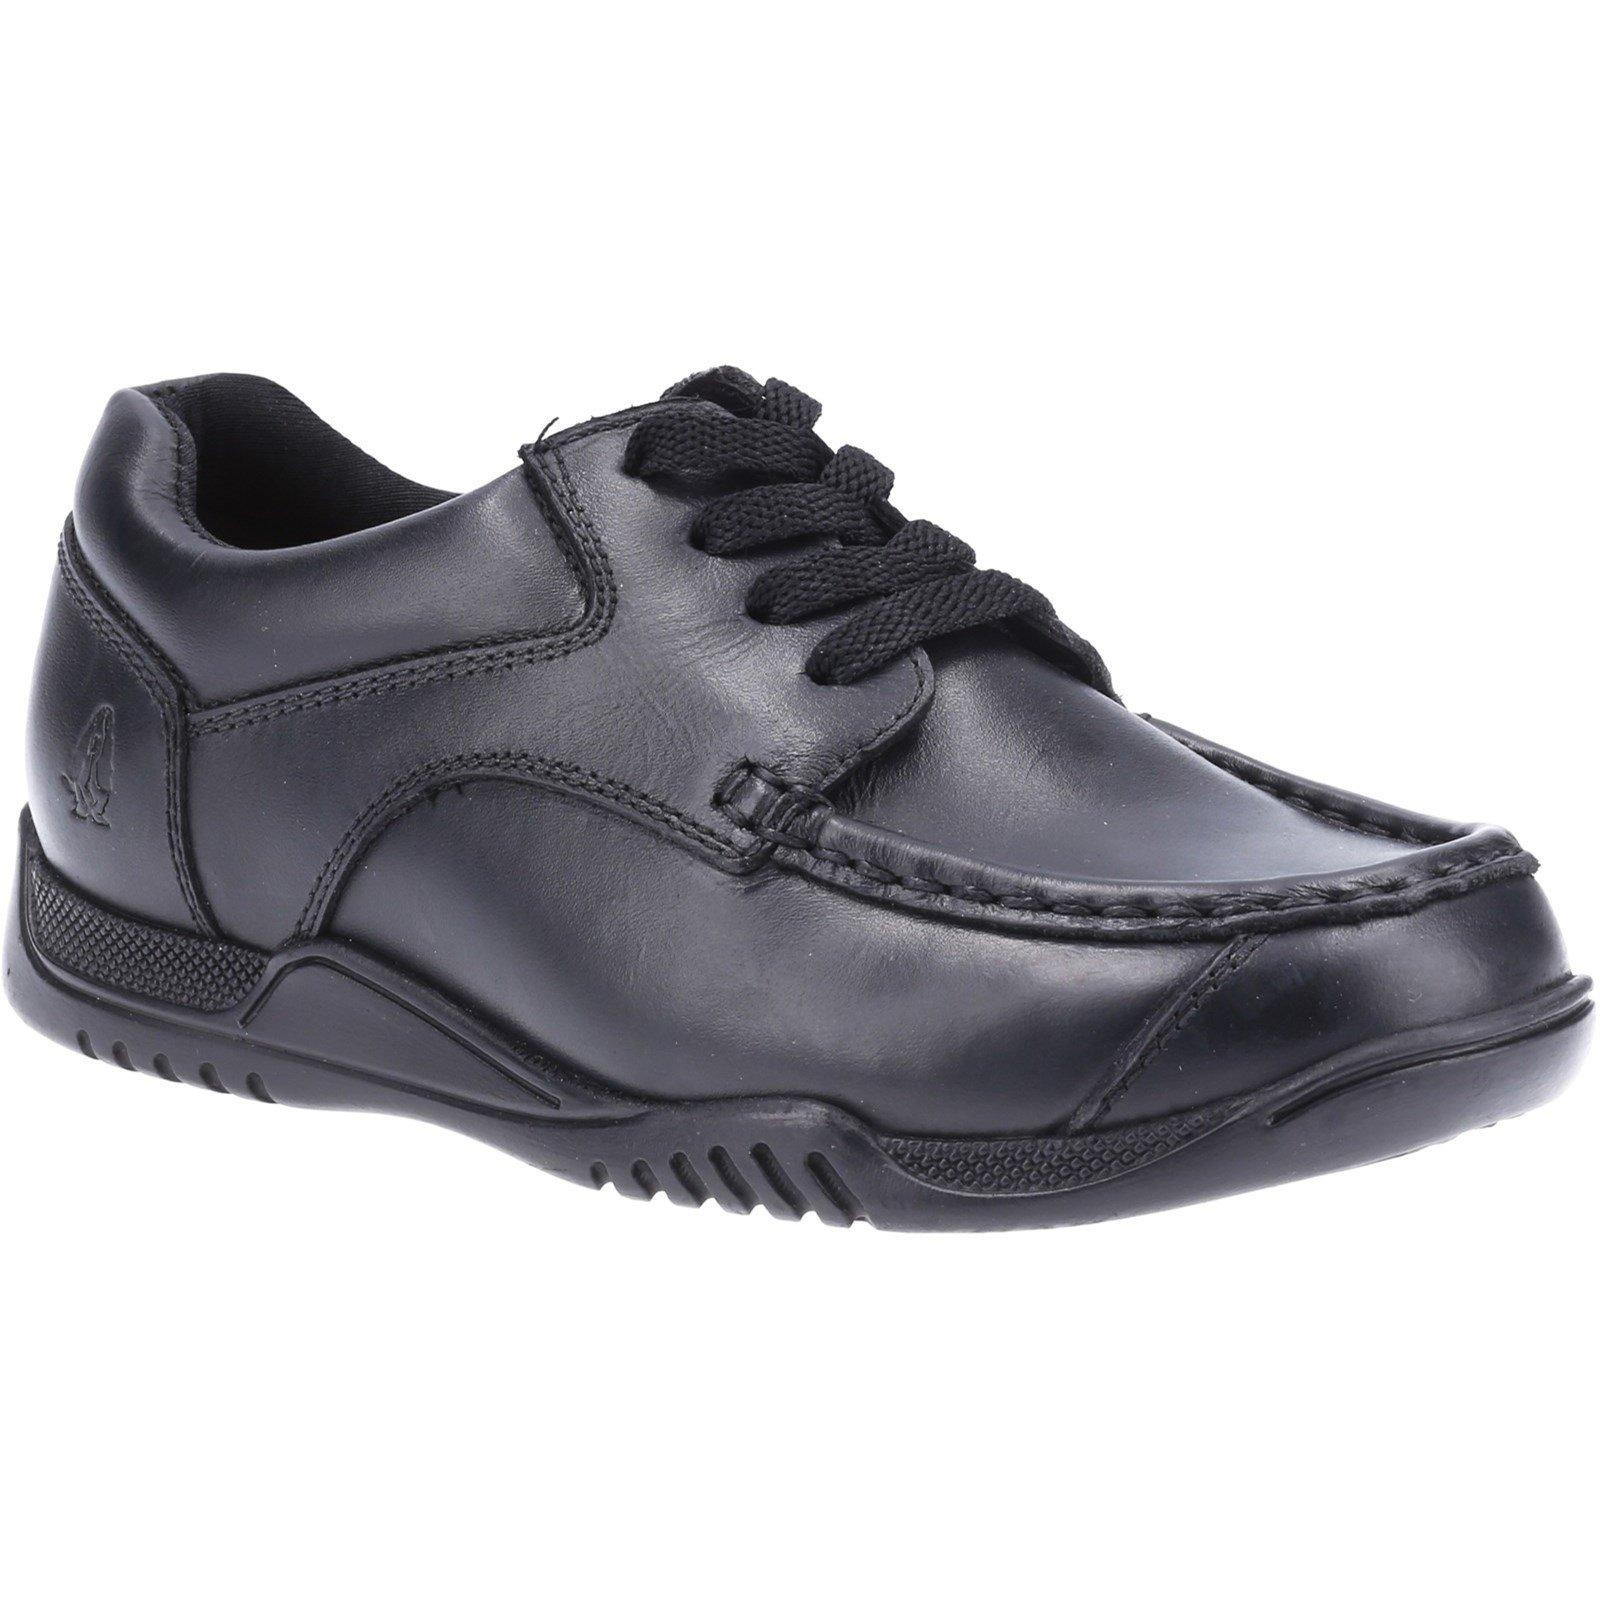 Hush Puppies Kid's Hudson Junior School Shoe Black 32582 - Black 11